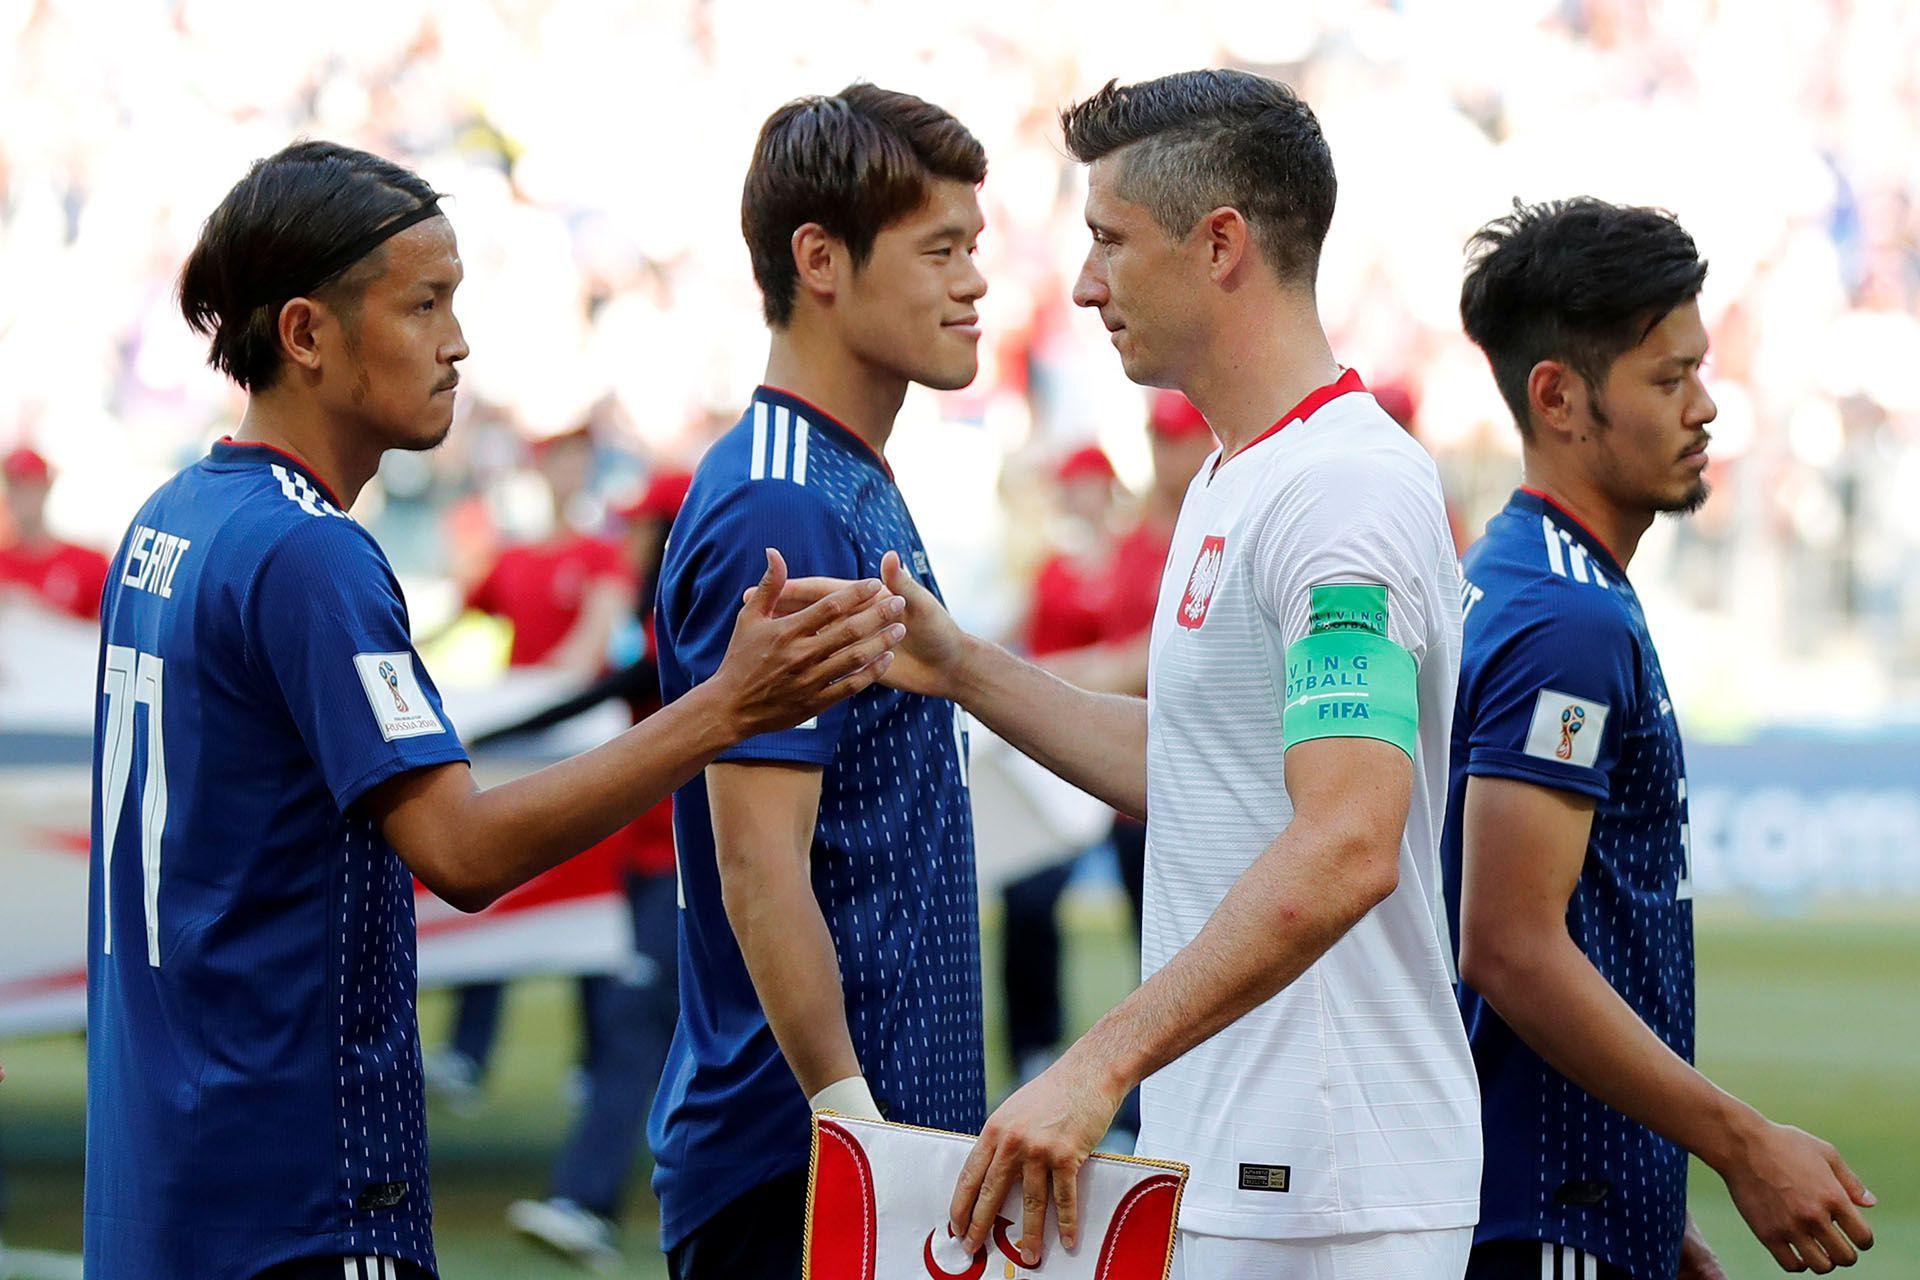 Robert Lewandowski fue el capitán de Polonia en el Mundial de Rusia 2018 (REUTERS)